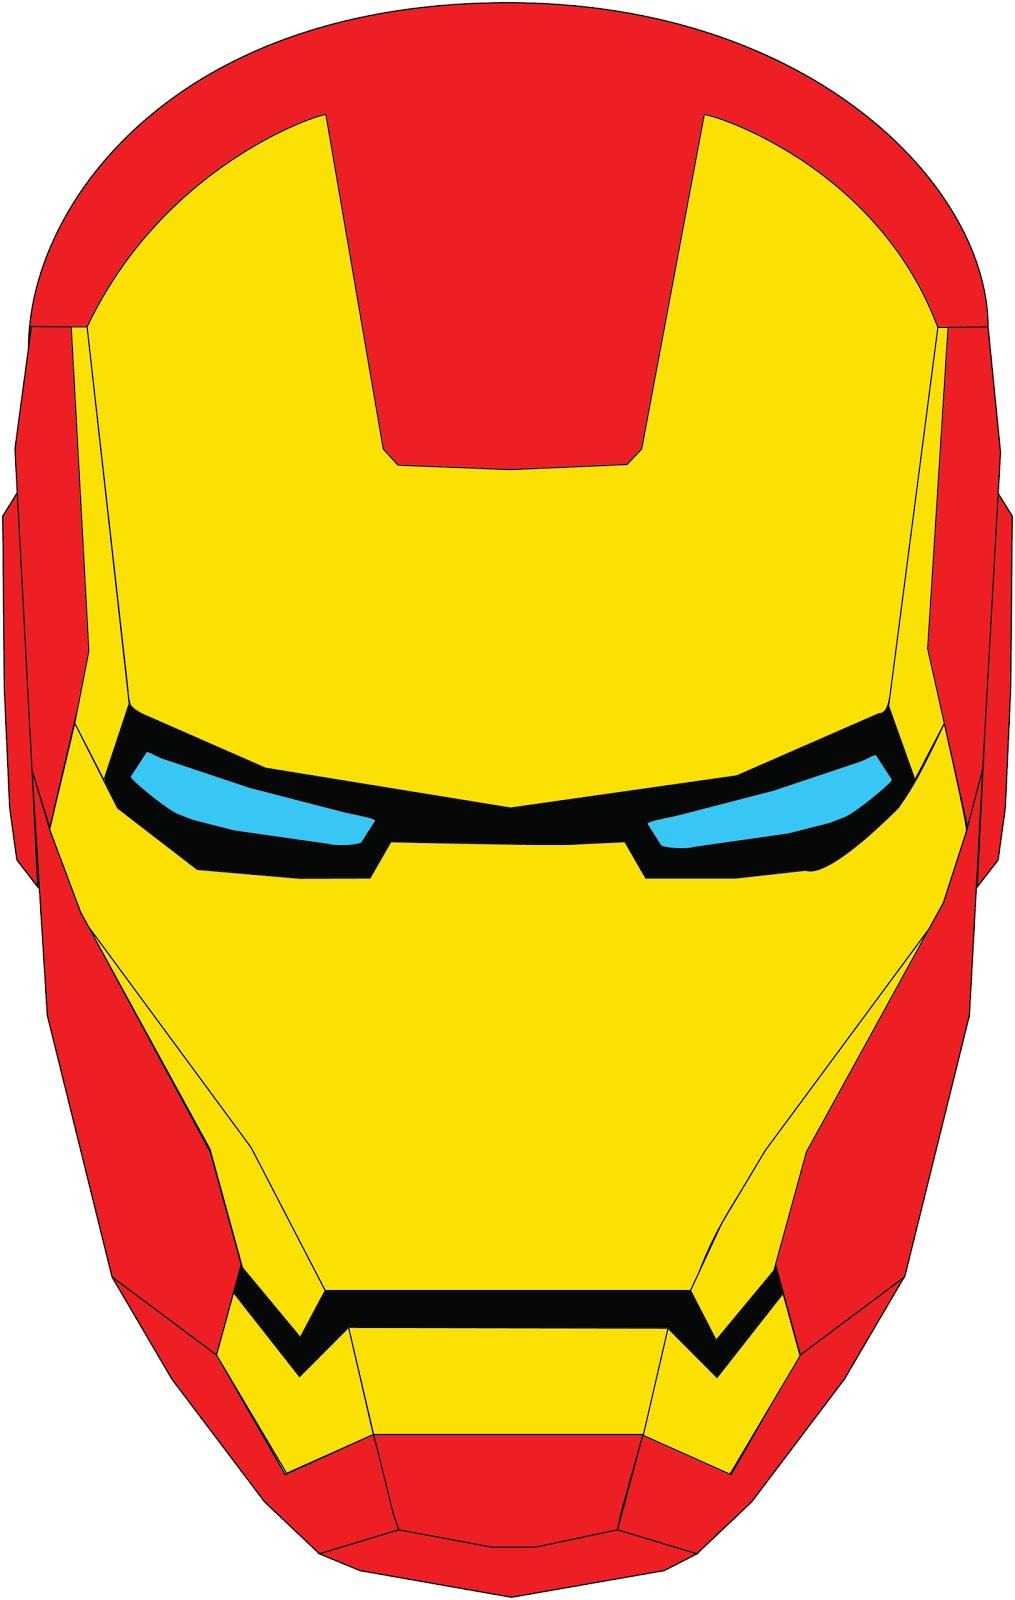 1015x1600 Damien Mallon Graphic Design Amp Illustration Iron Man Vectors